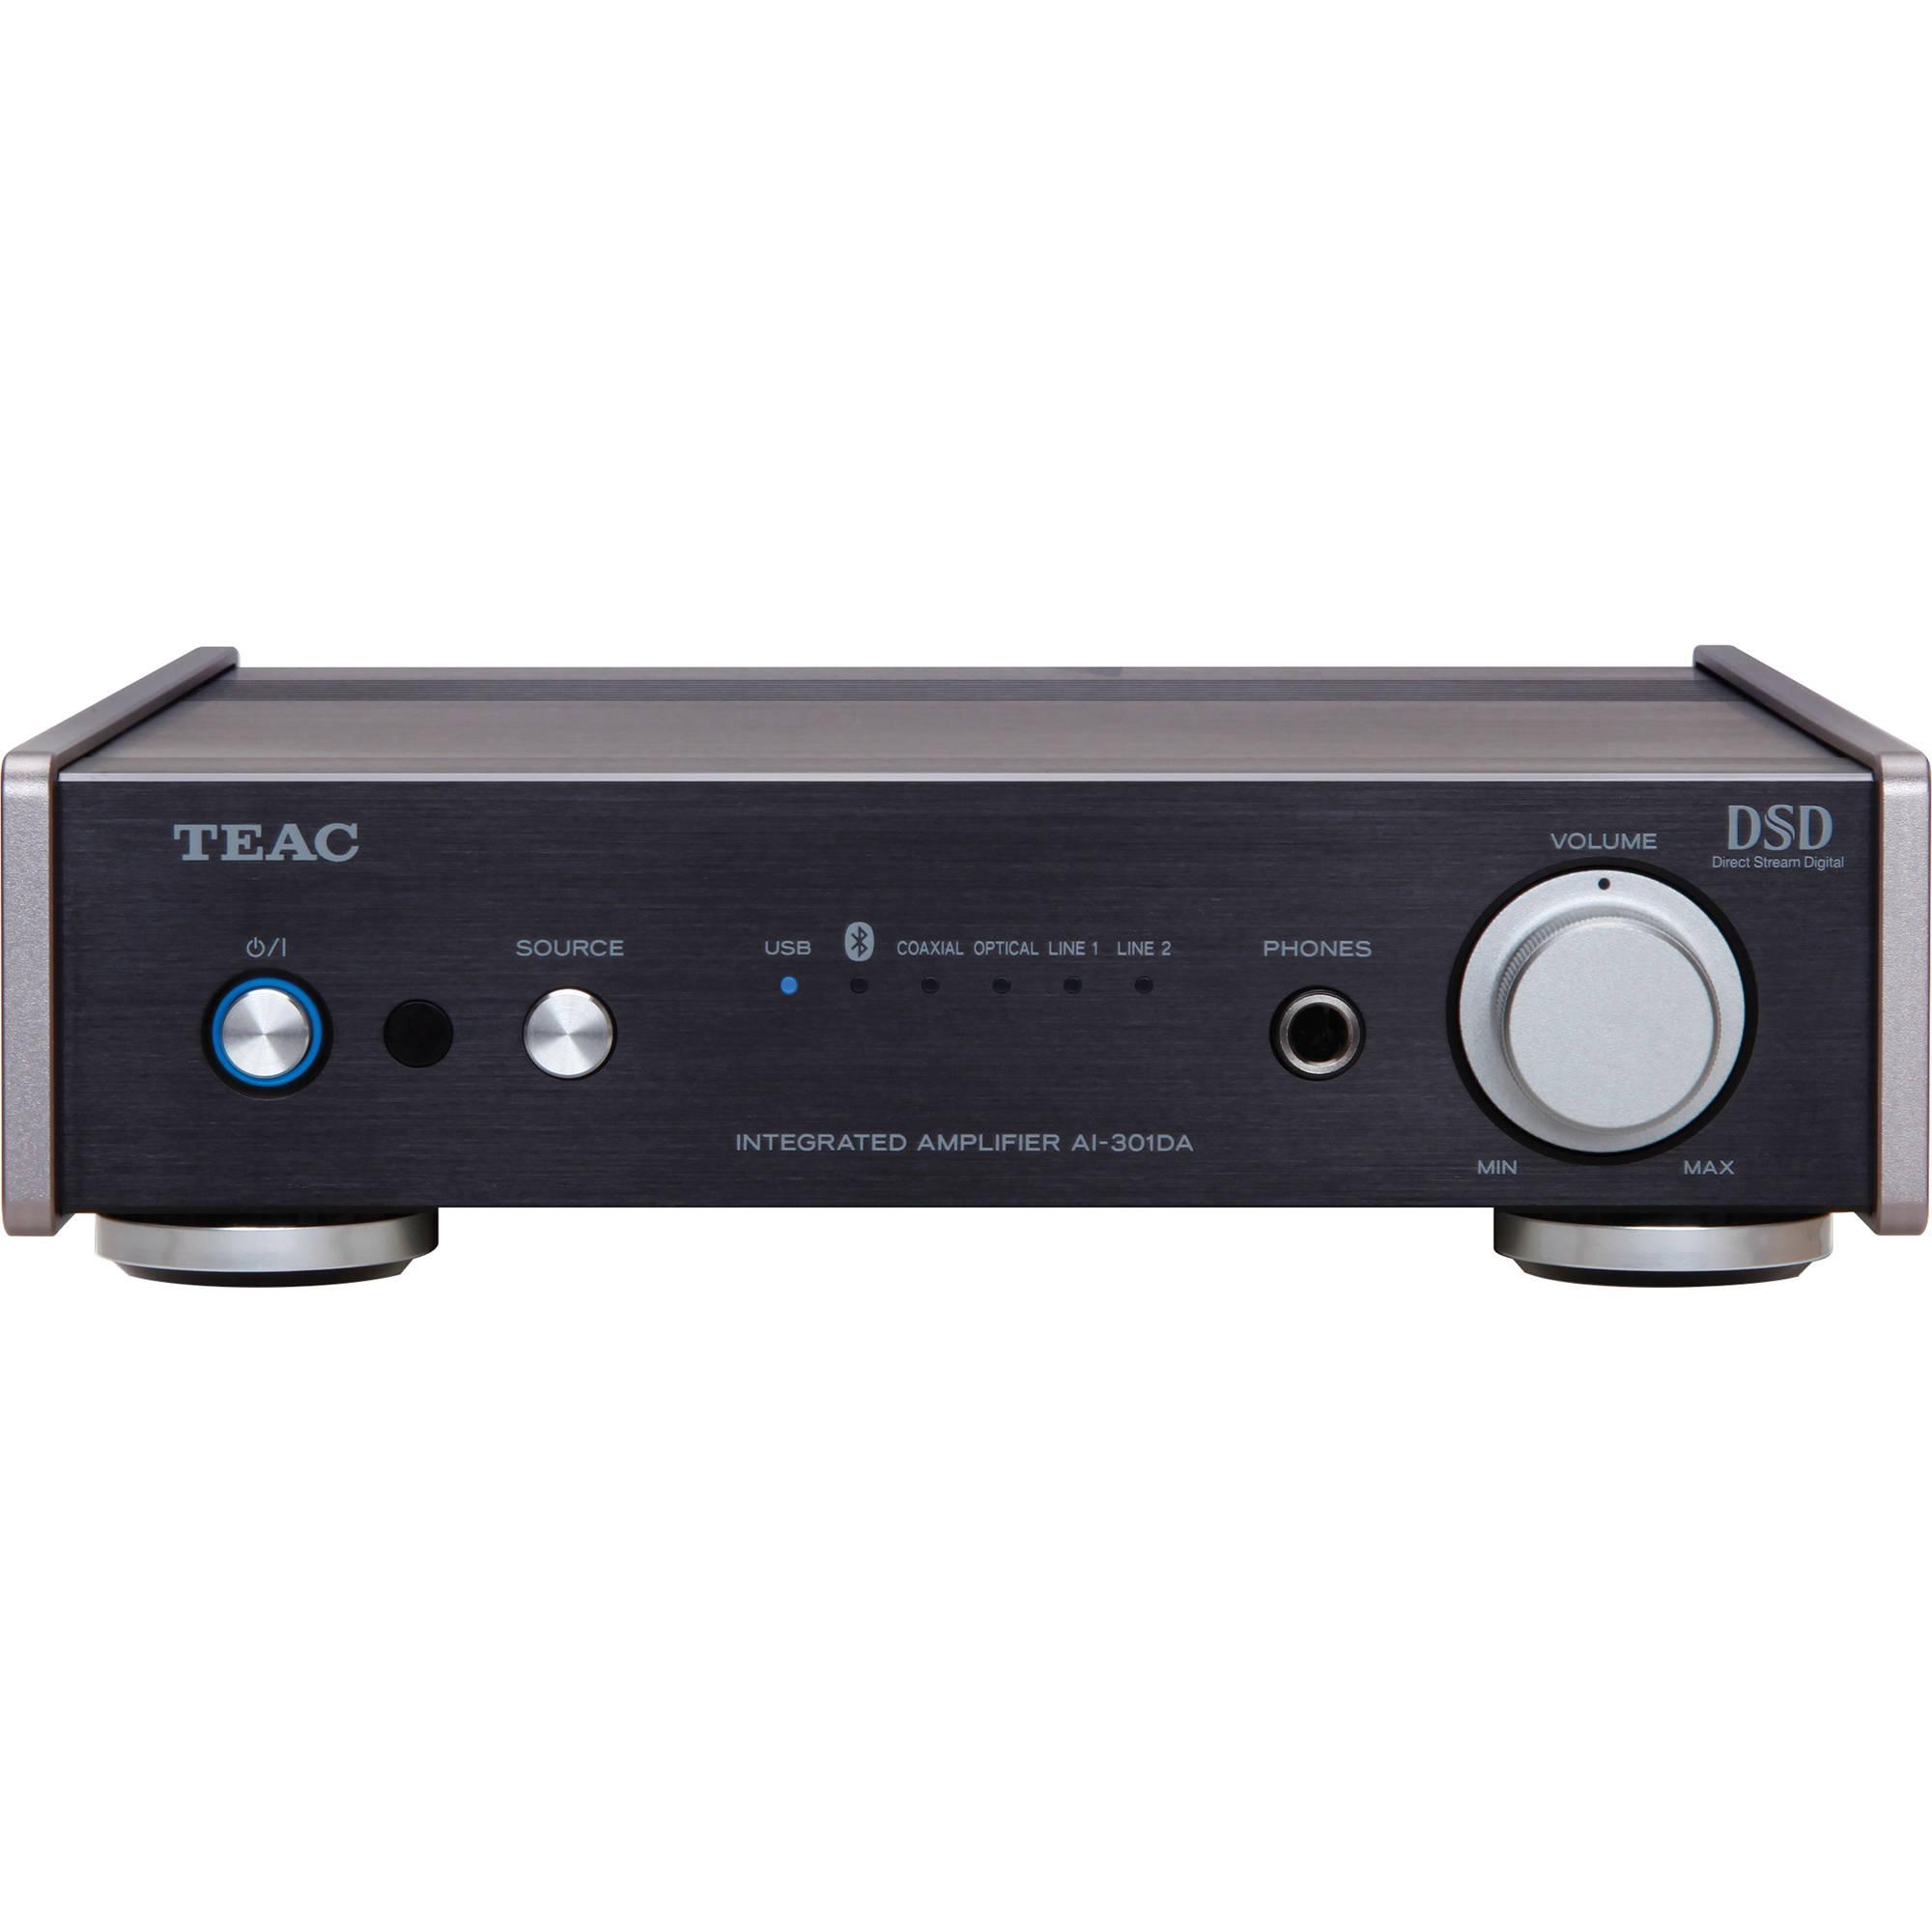 Teac Ai 301da B Pre Main Amplifier With Bluetooth 100mw Stereo Circuit Based Tl082 Usb And